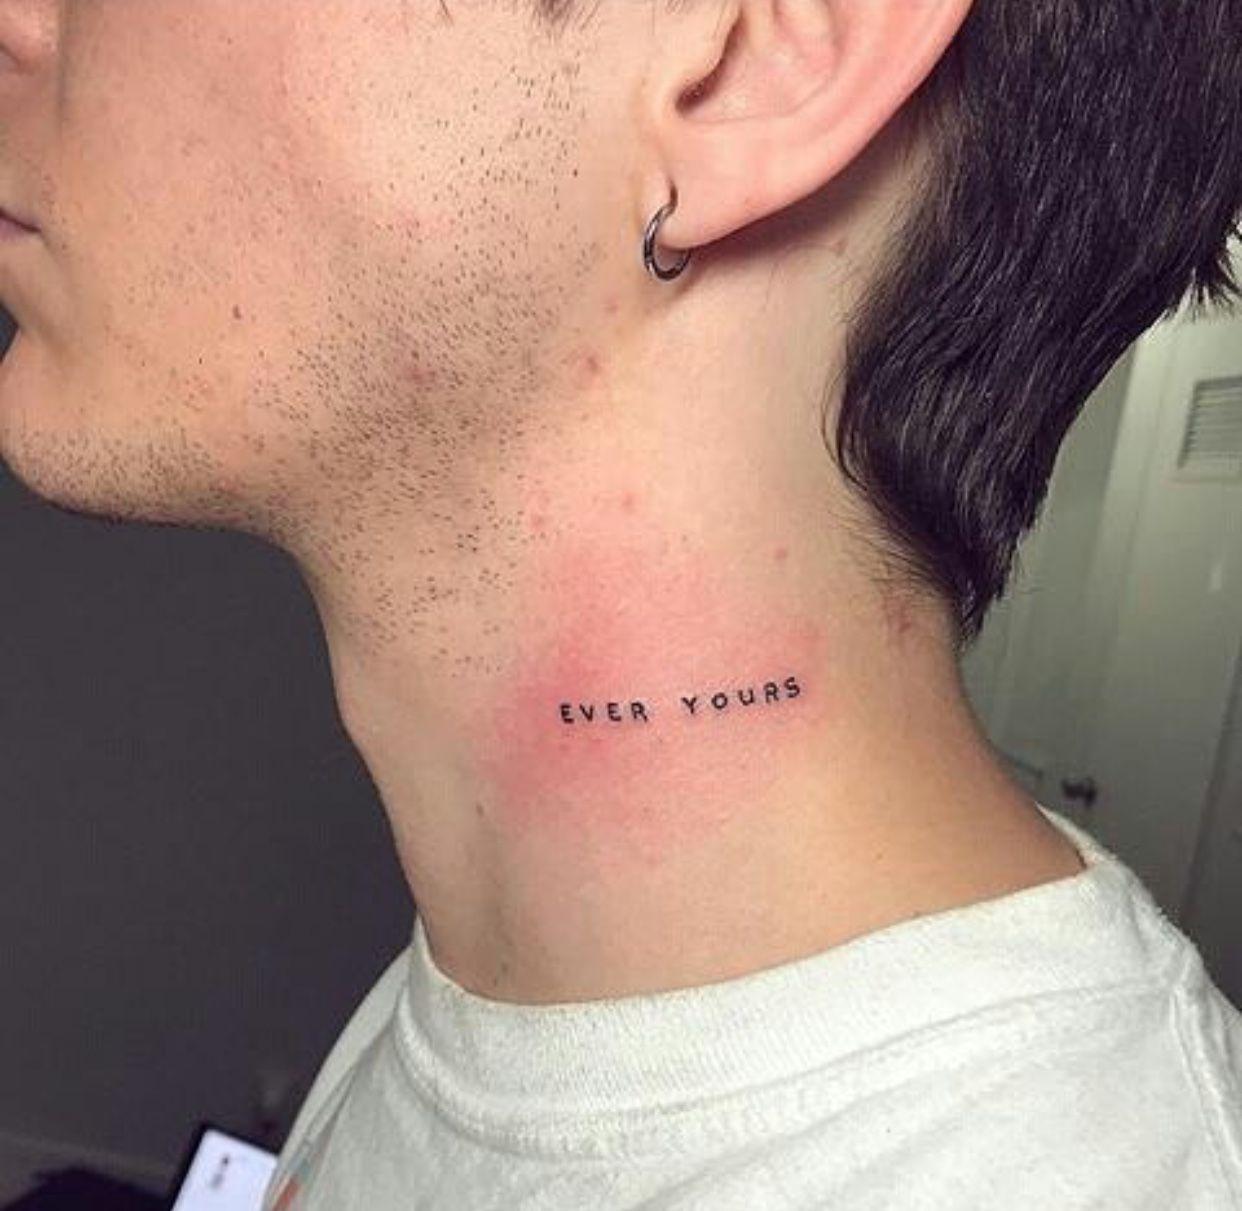 Pin De Davaughn White En Tatuagens Tatuajes Cuello Tatuaje Del Cuello Tatuajes Inspiradores